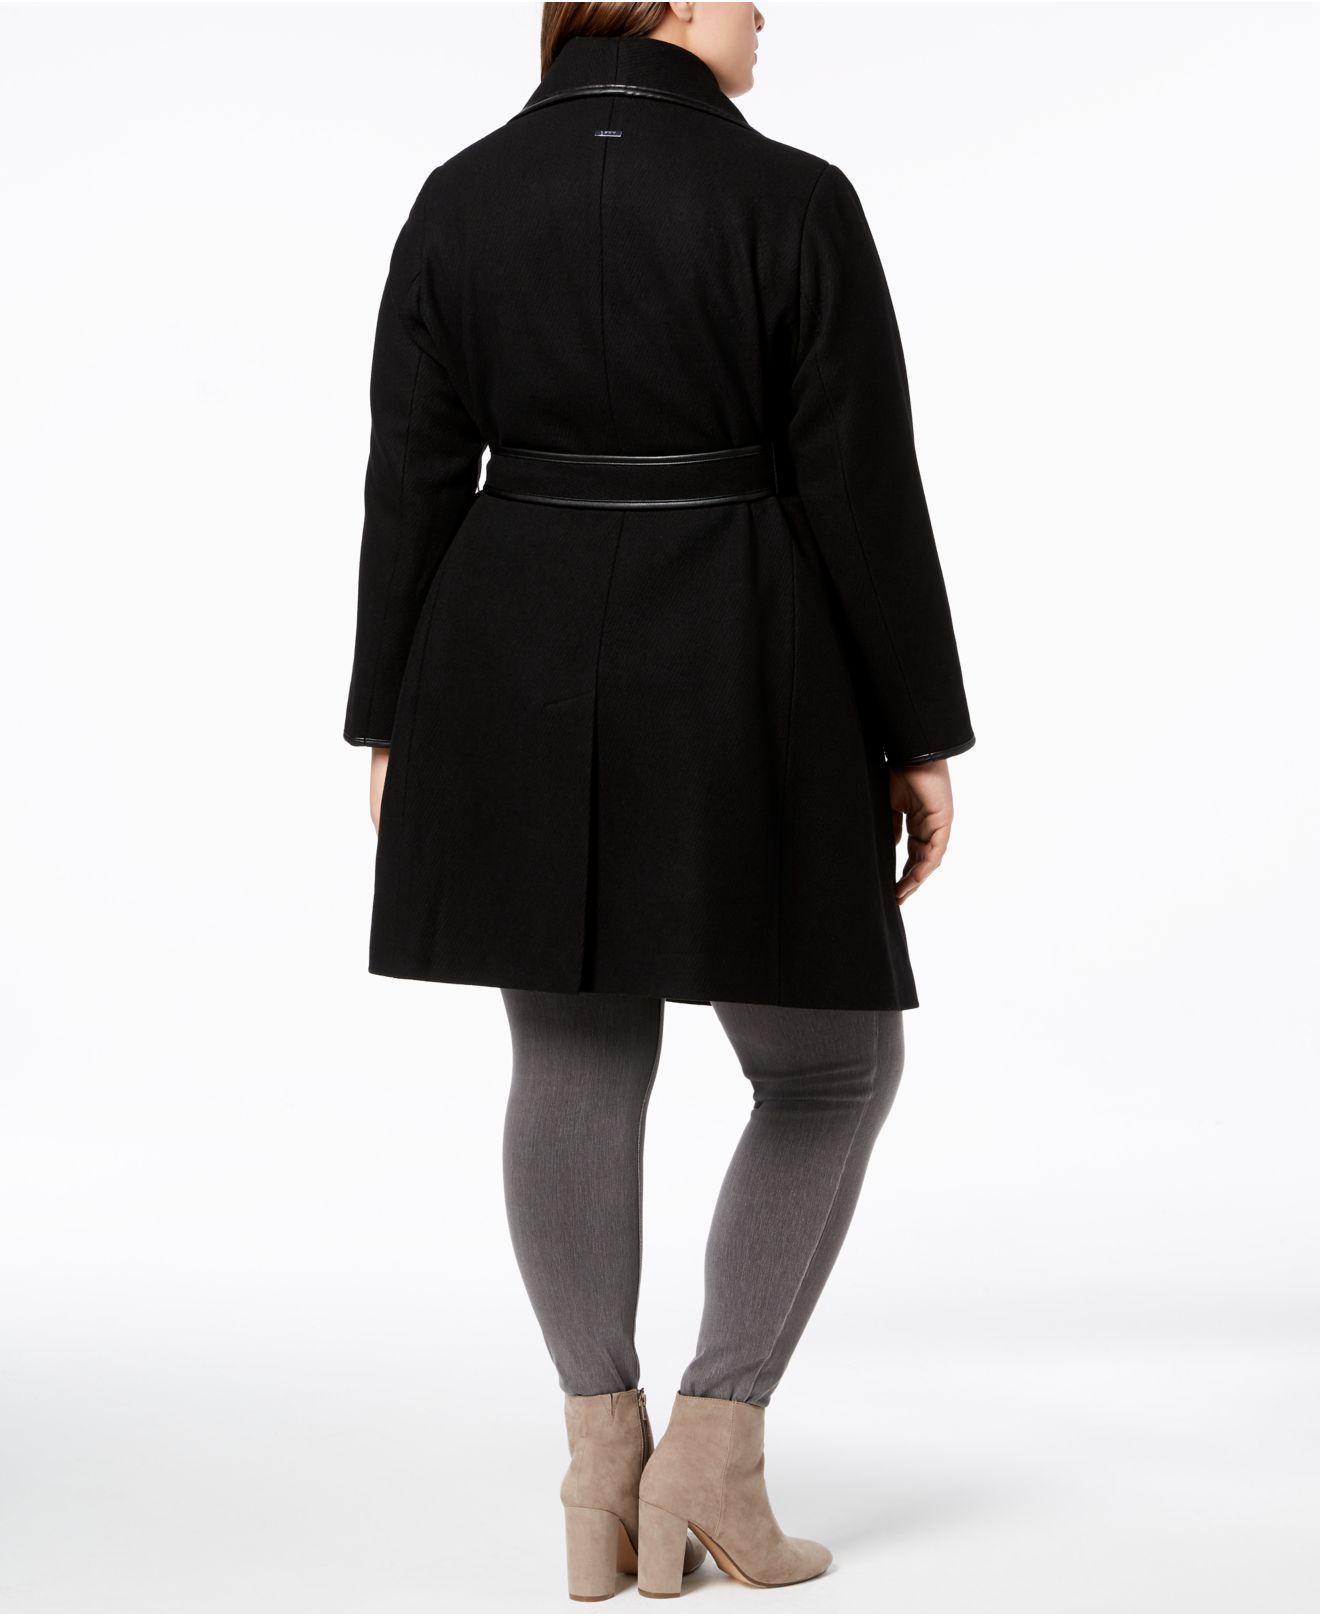 772ee2fd7cfb8 Lyst - DKNY Plus Size Faux-leather-trim Wrap Coat